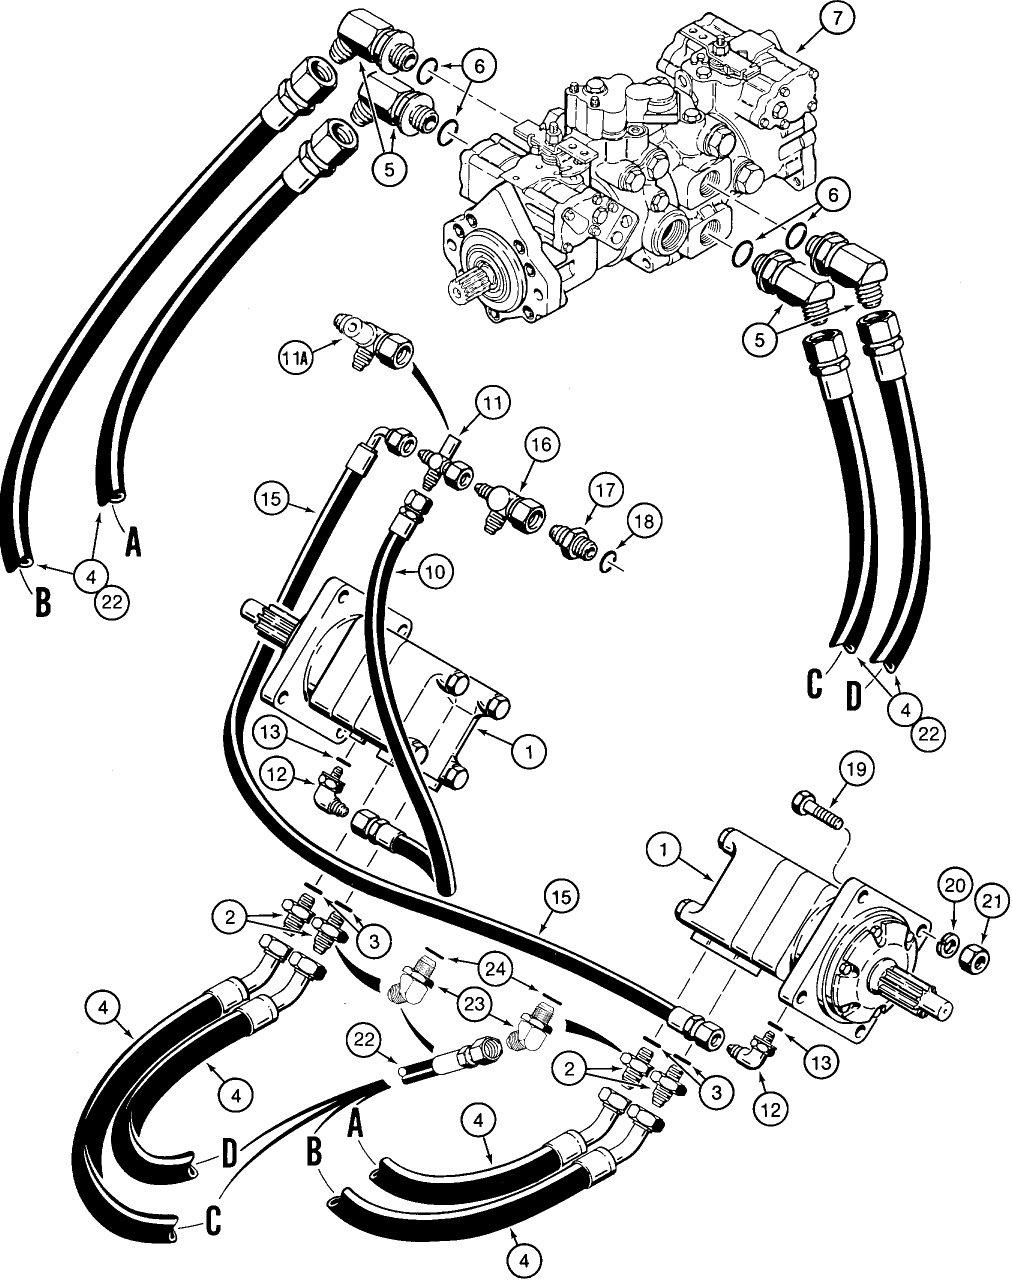 65d5o Case Skidsteer 1835c Changed Presure Line Develop